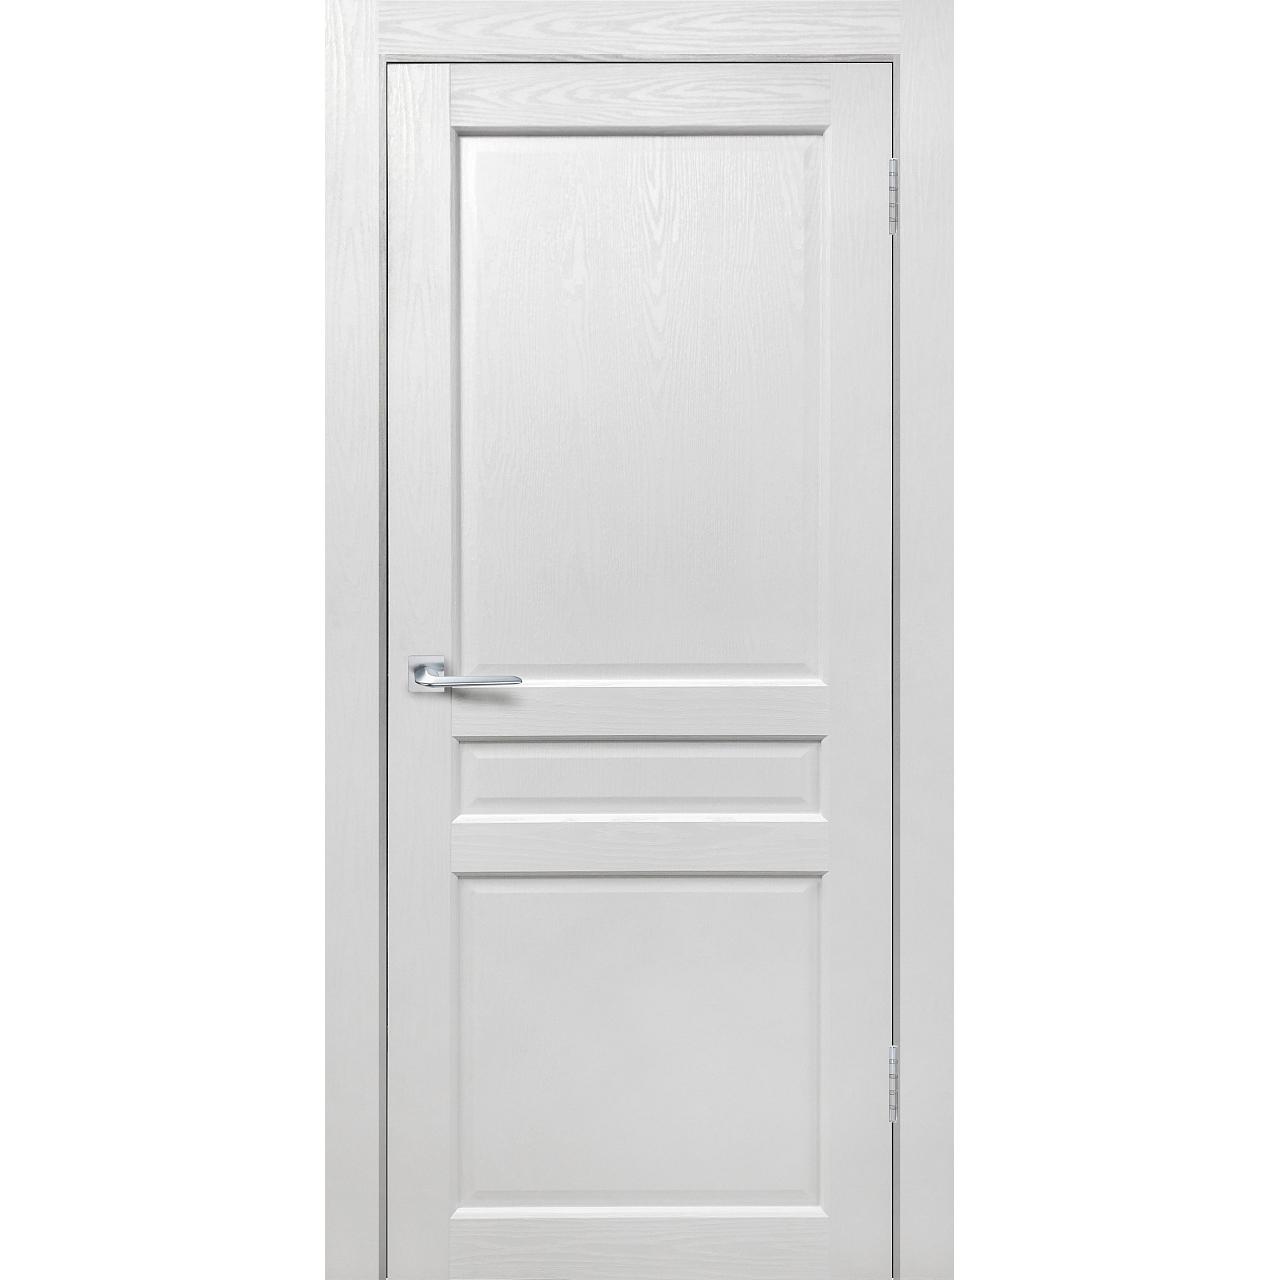 "Межкомнатная дверь экошпон ""Матрикс МК-1"" полотно глухое"